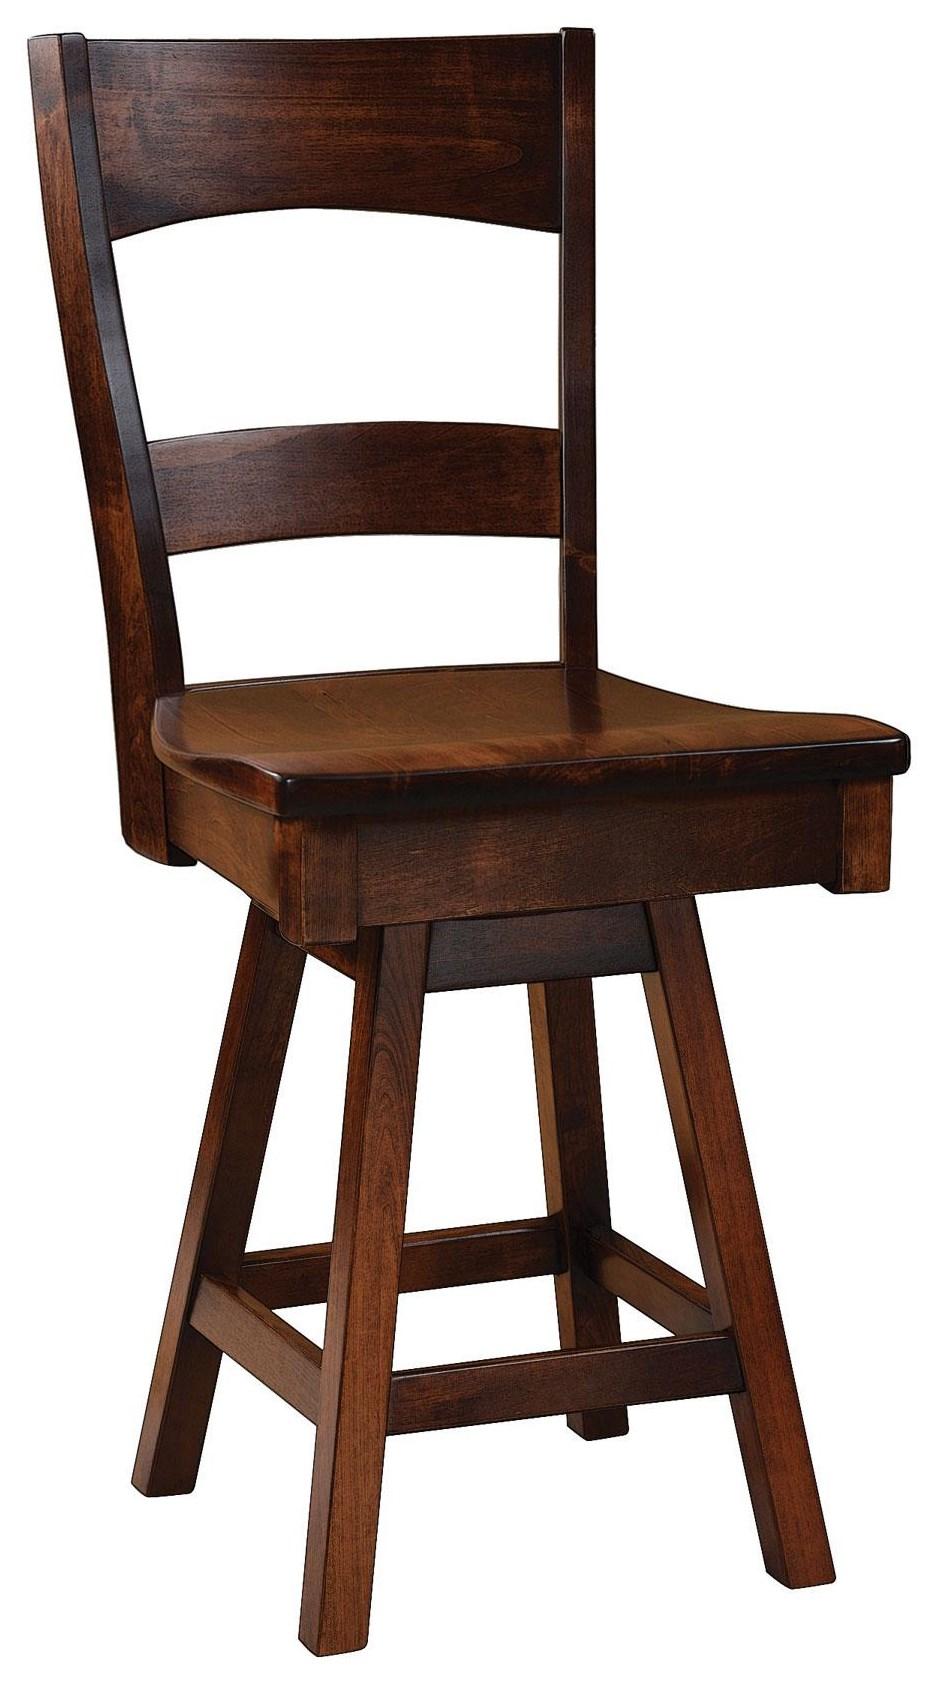 "Coalton 24"" Swivel Stool by Wengerd Wood Products at Wayside Furniture"